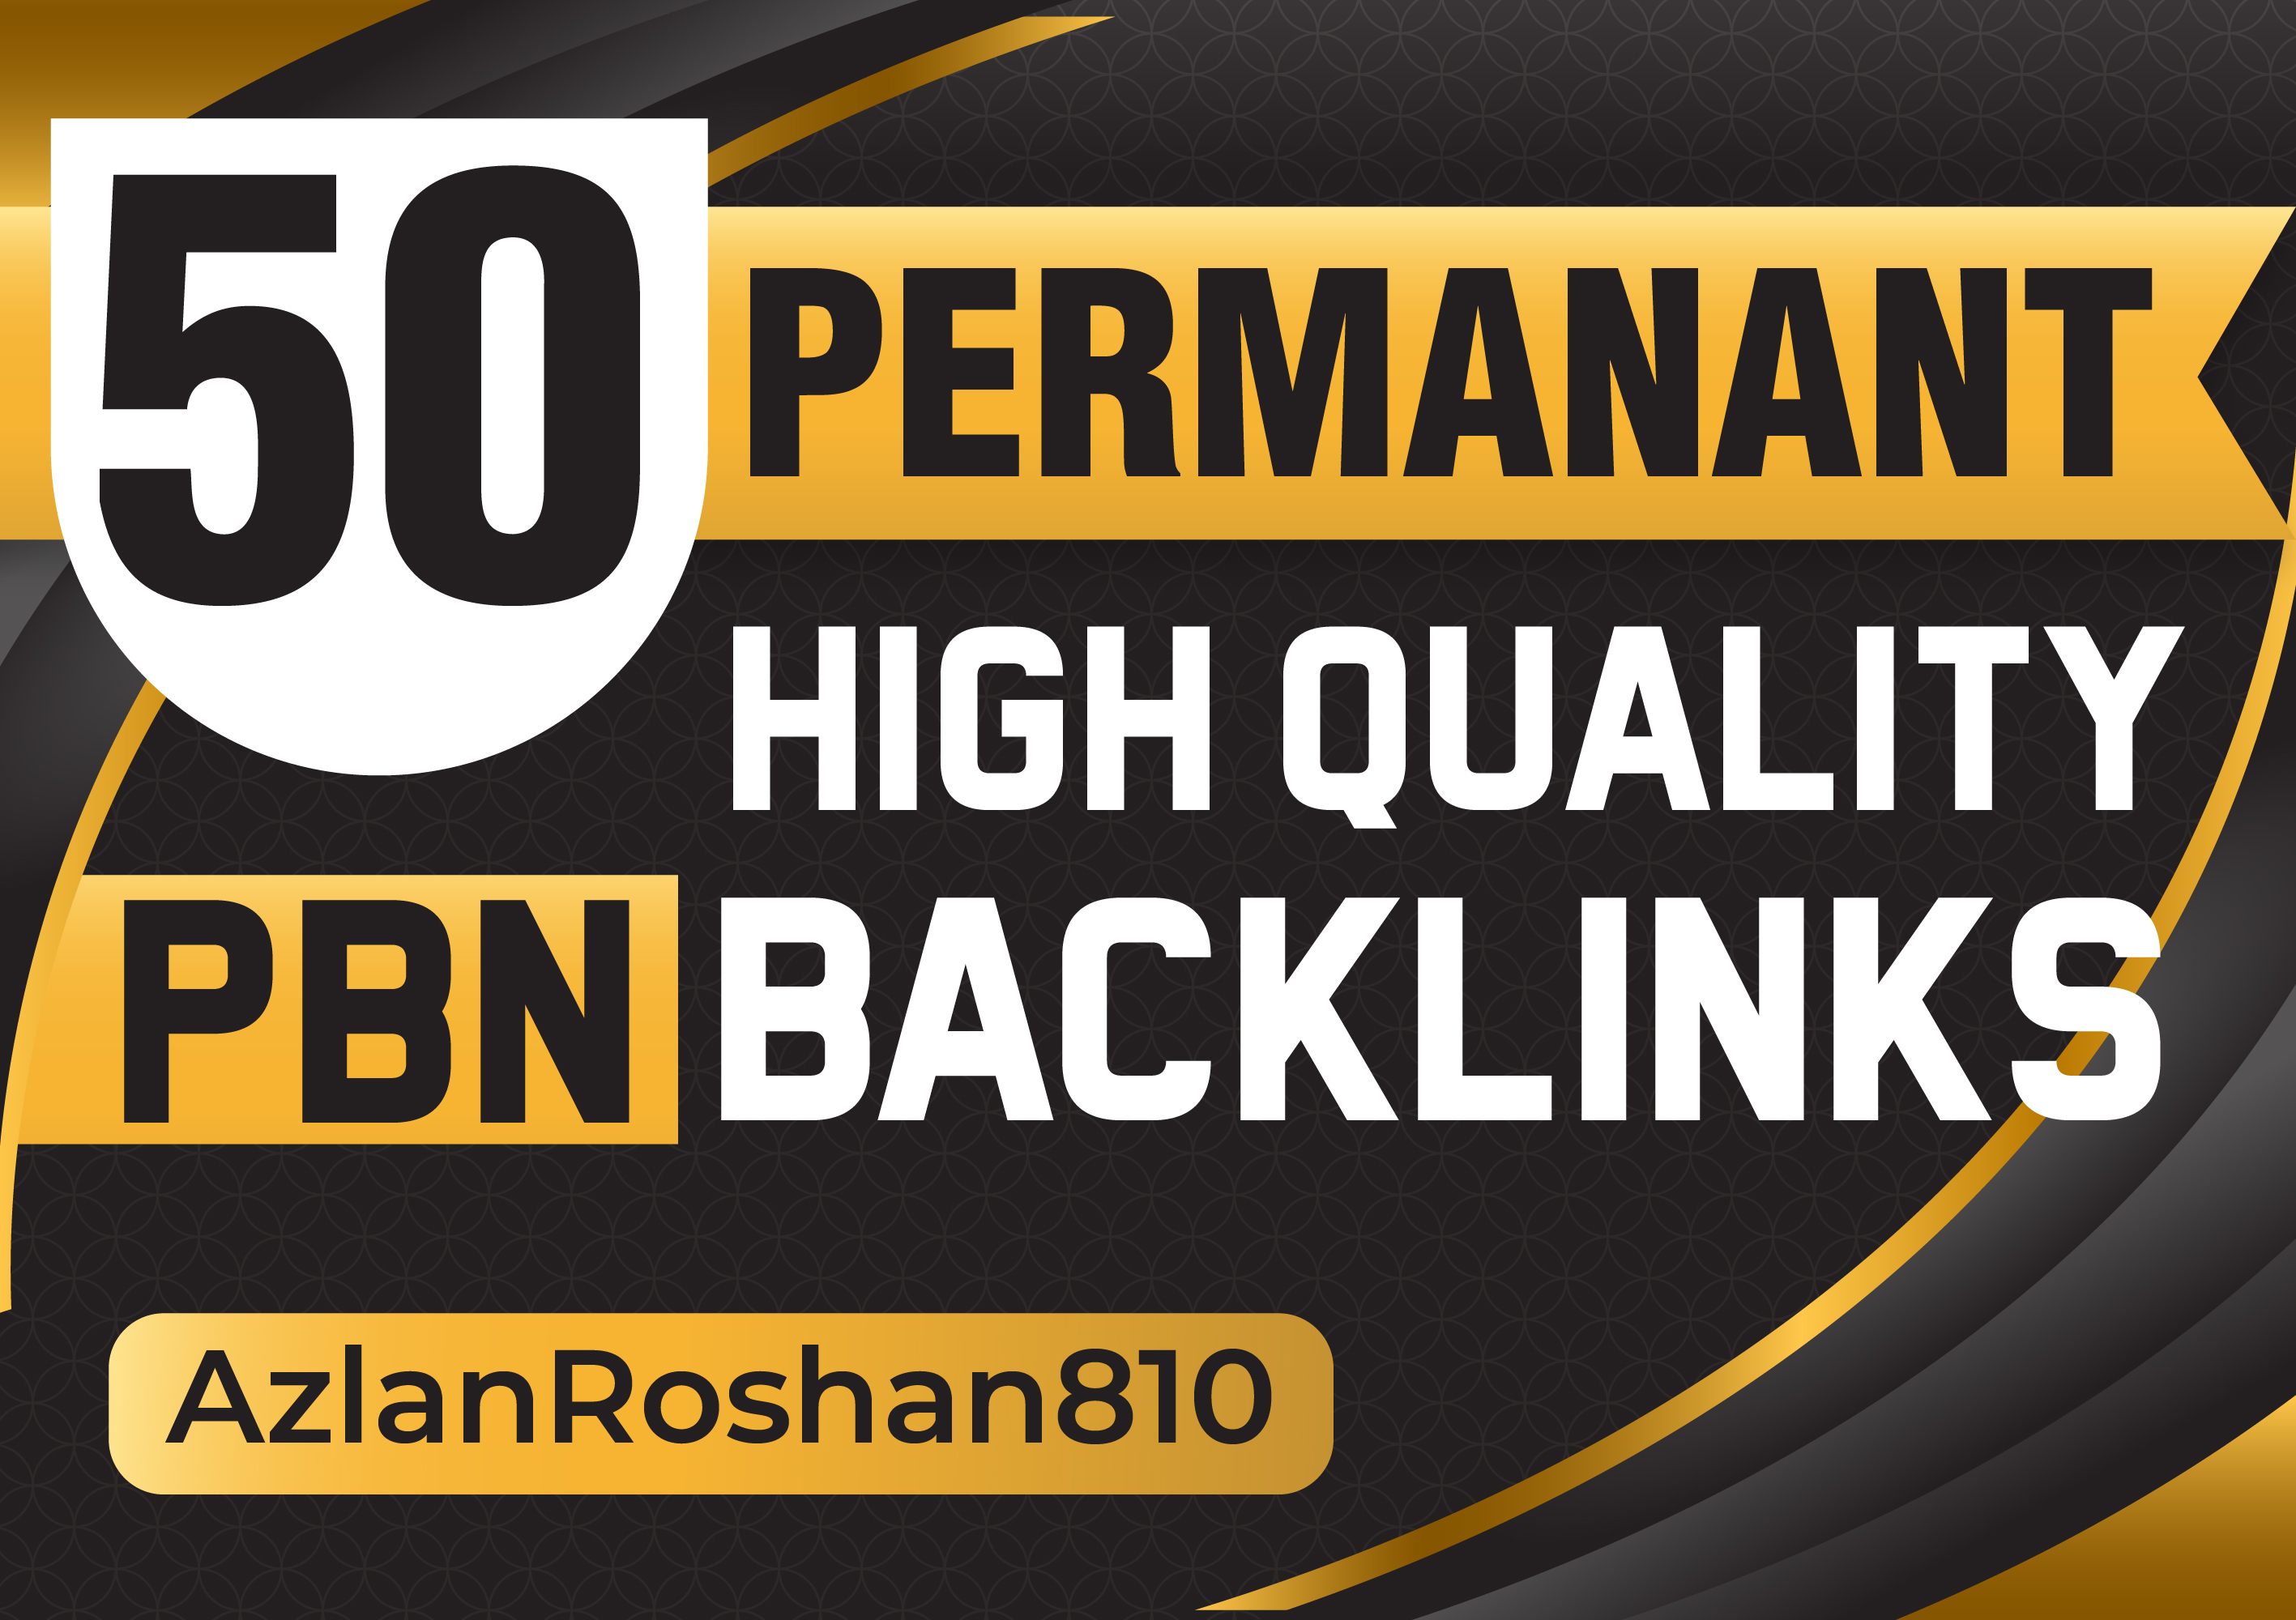 50 High Quality Permanent PBN Backlinks